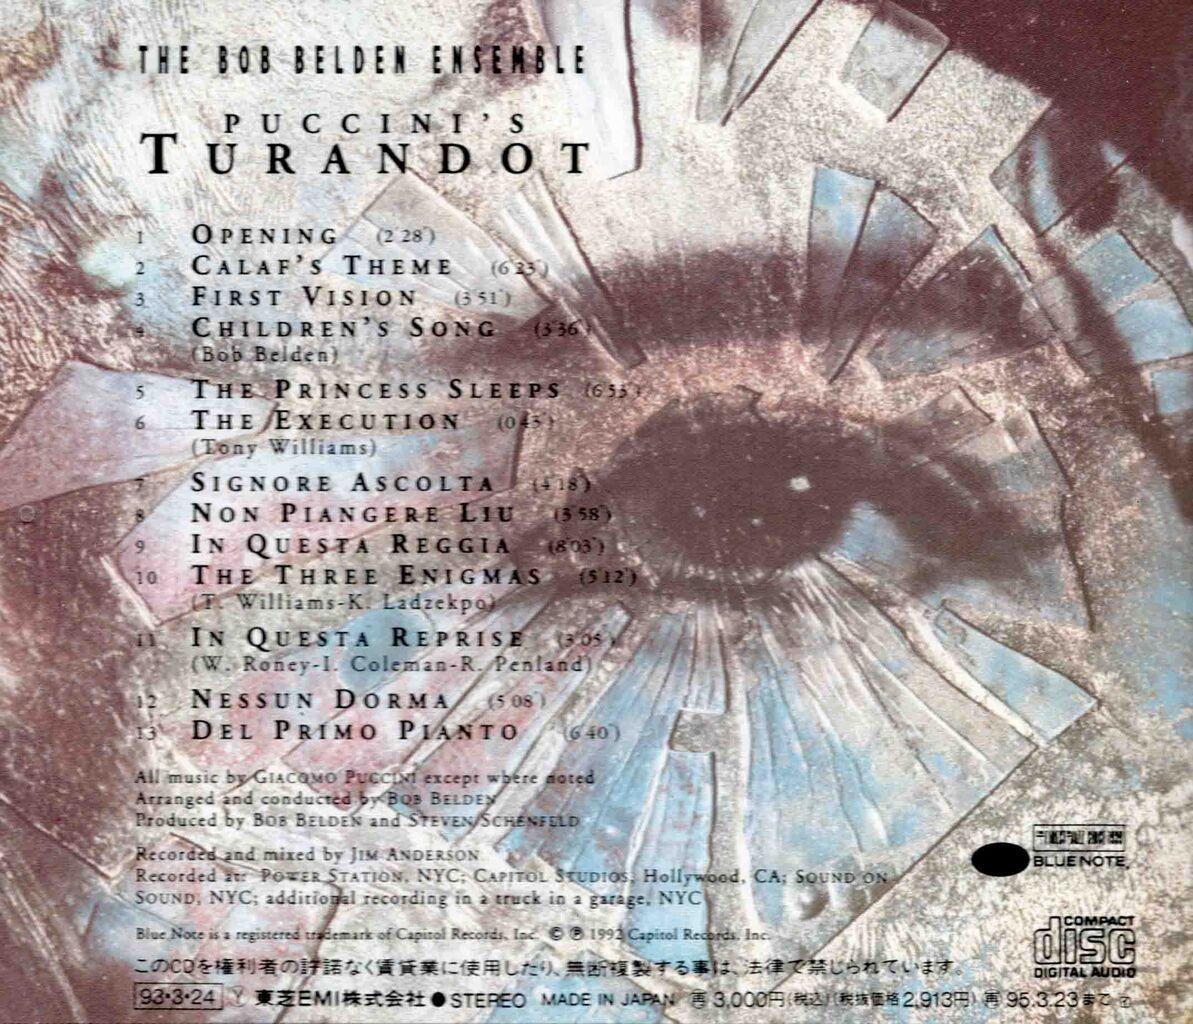 PUCCINI'S TURANDOT-2